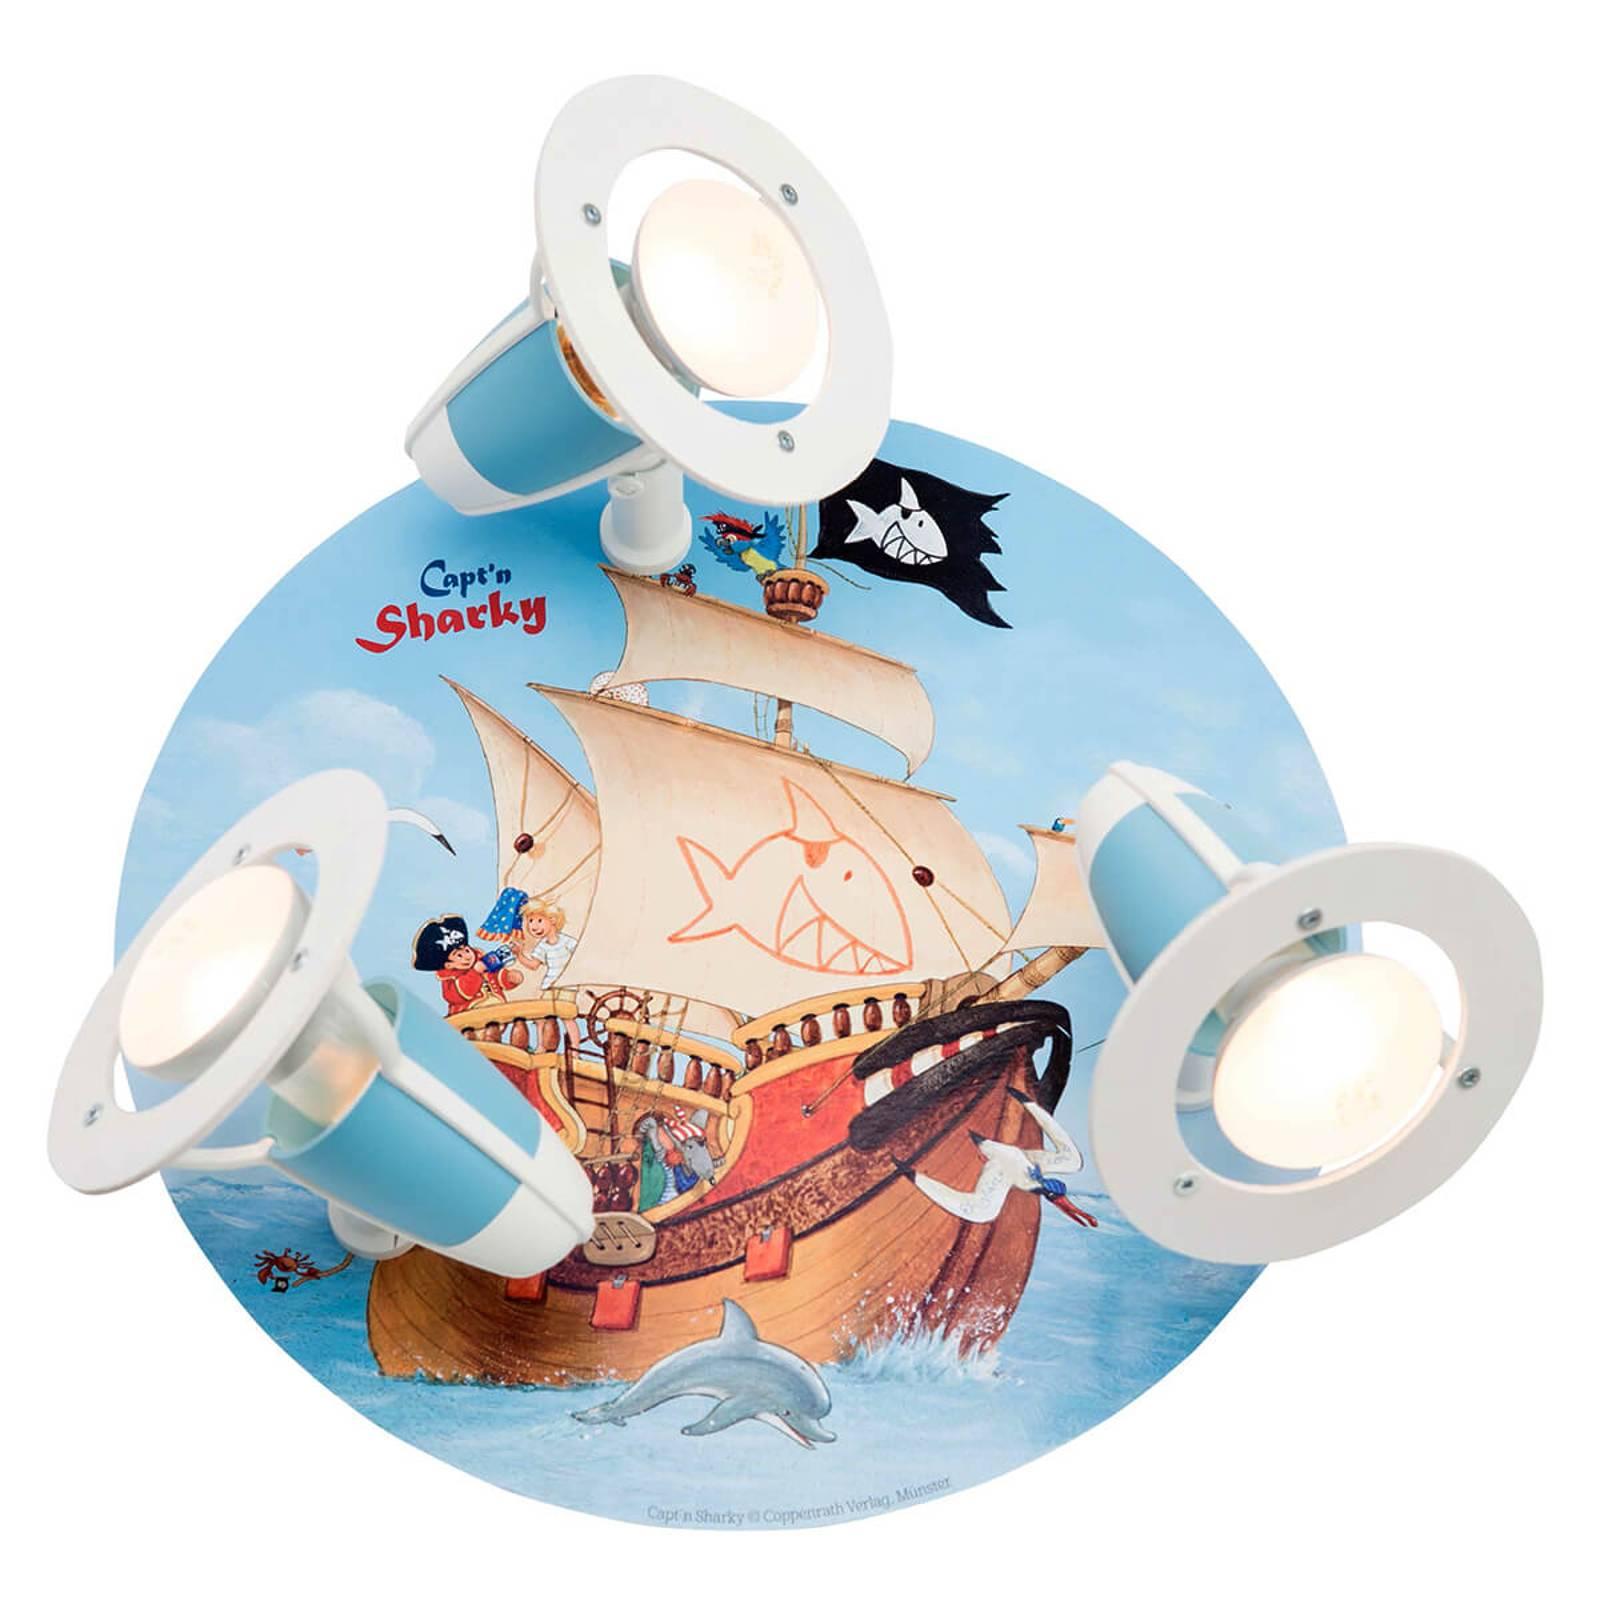 Plafondlamp Capt'n Sharky voor de kinderkamer